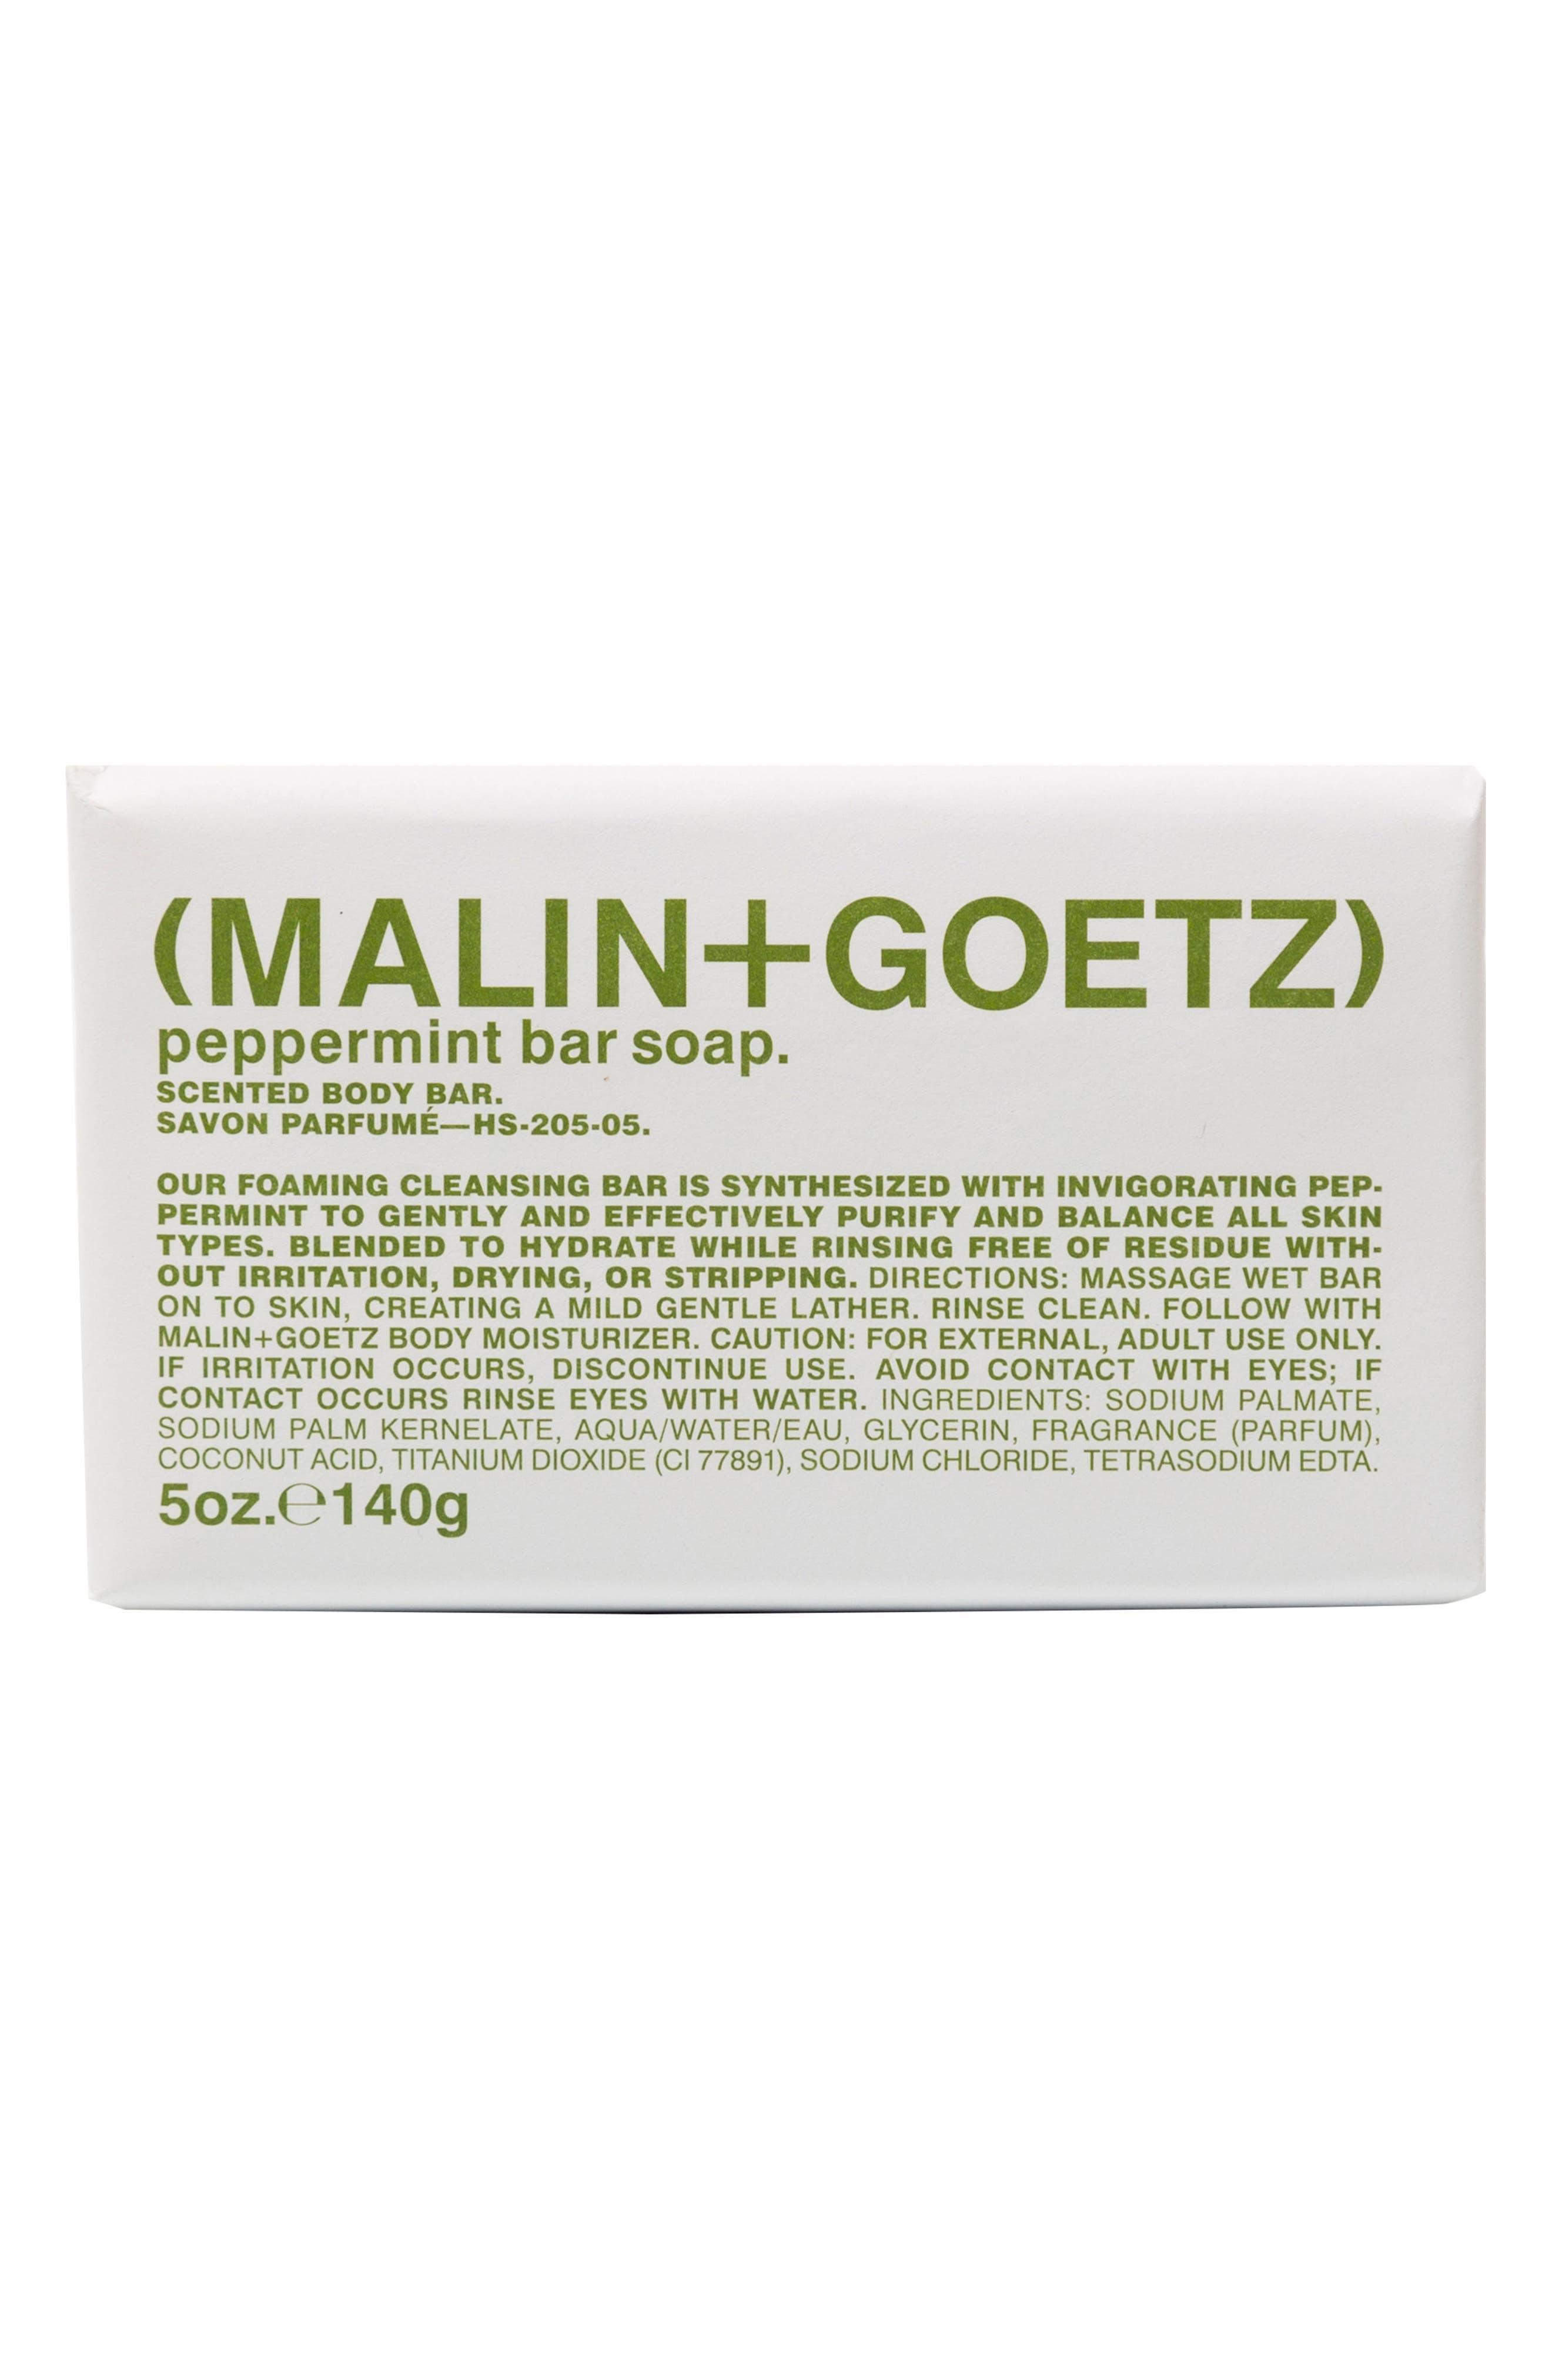 Alternate Image 1 Selected - MALIN+GOETZ Peppermint Bar Soap